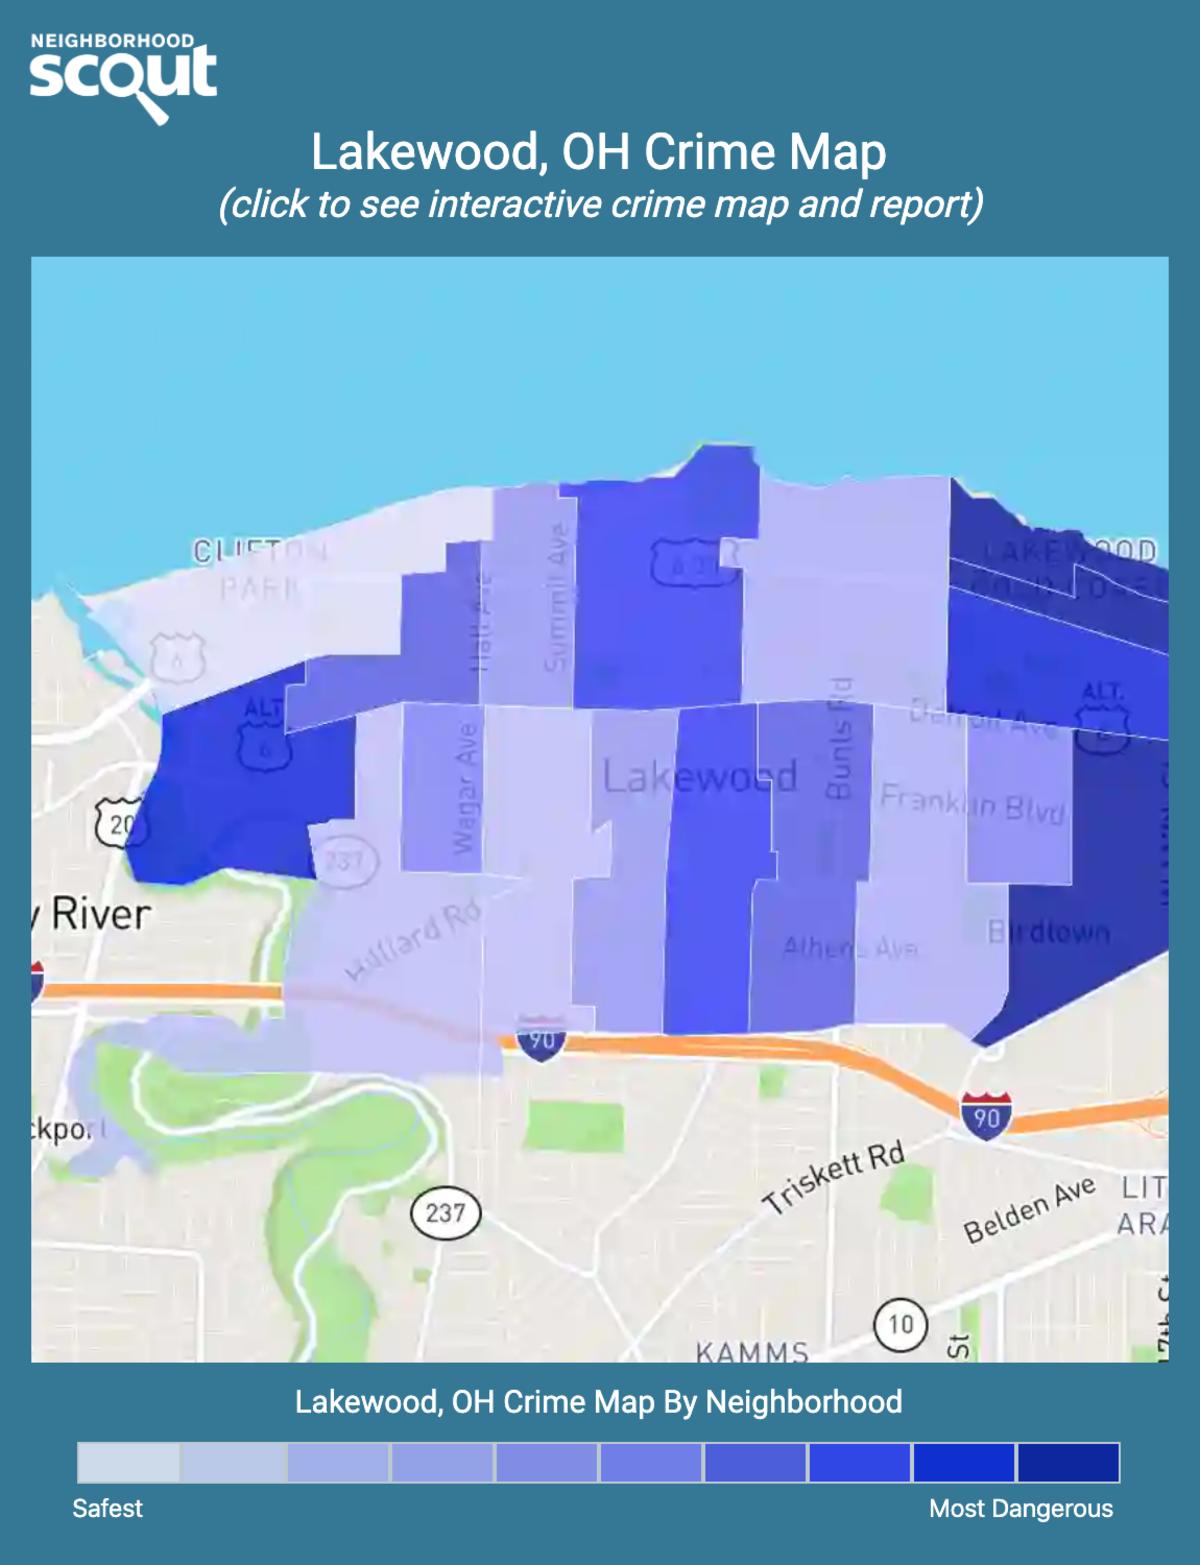 Lakewood, Ohio crime map